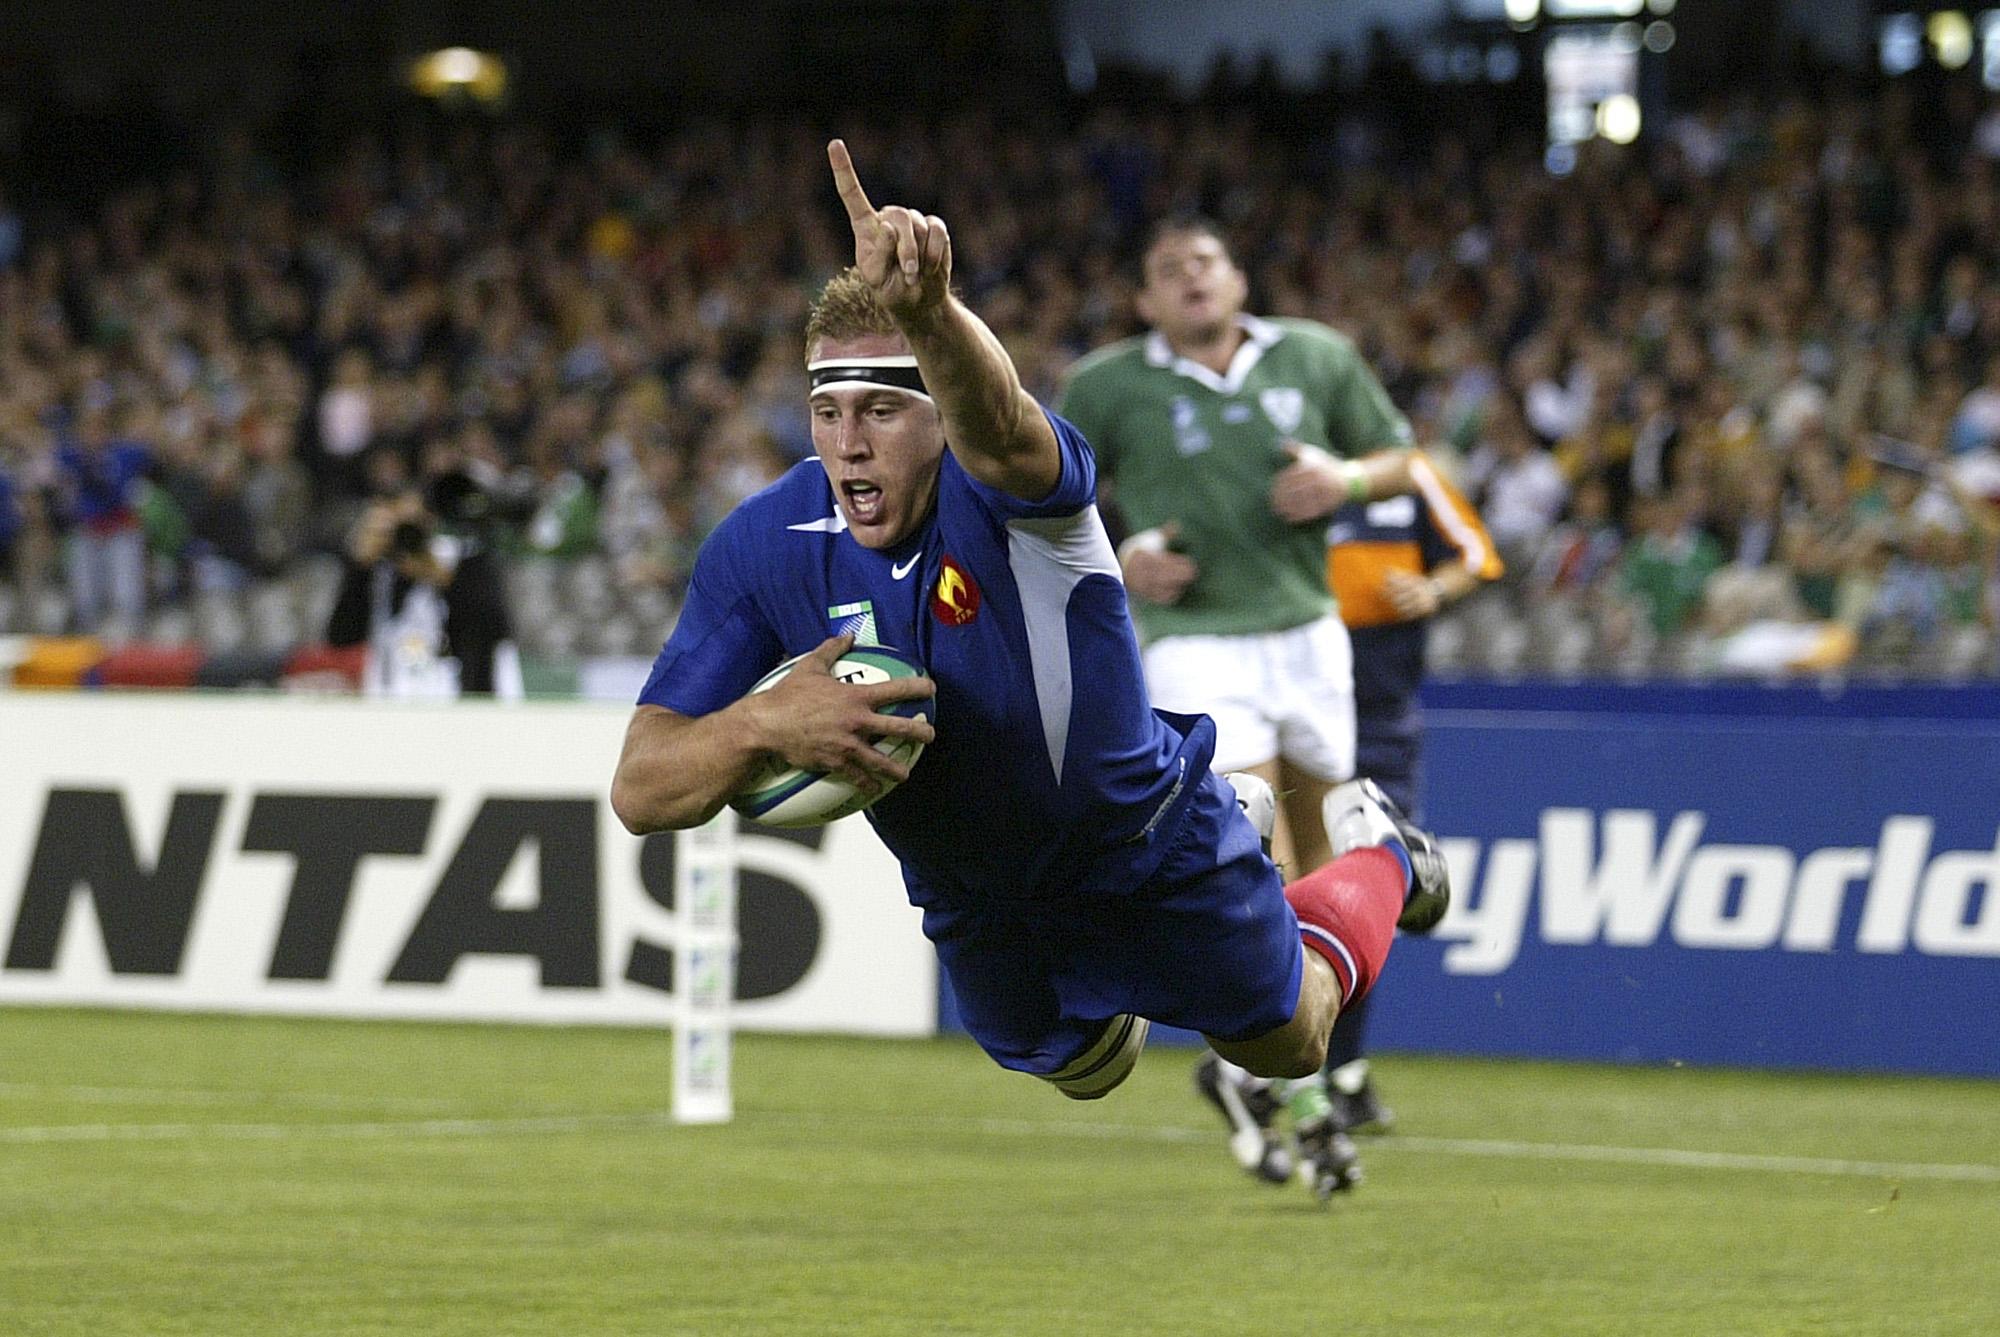 Essai Imanol Harinordoquy (France vs Irlande, Melbourne, AUSTRALIE, Coupe du Monde 2003) Copyright JEAN-MARIE HERVIO